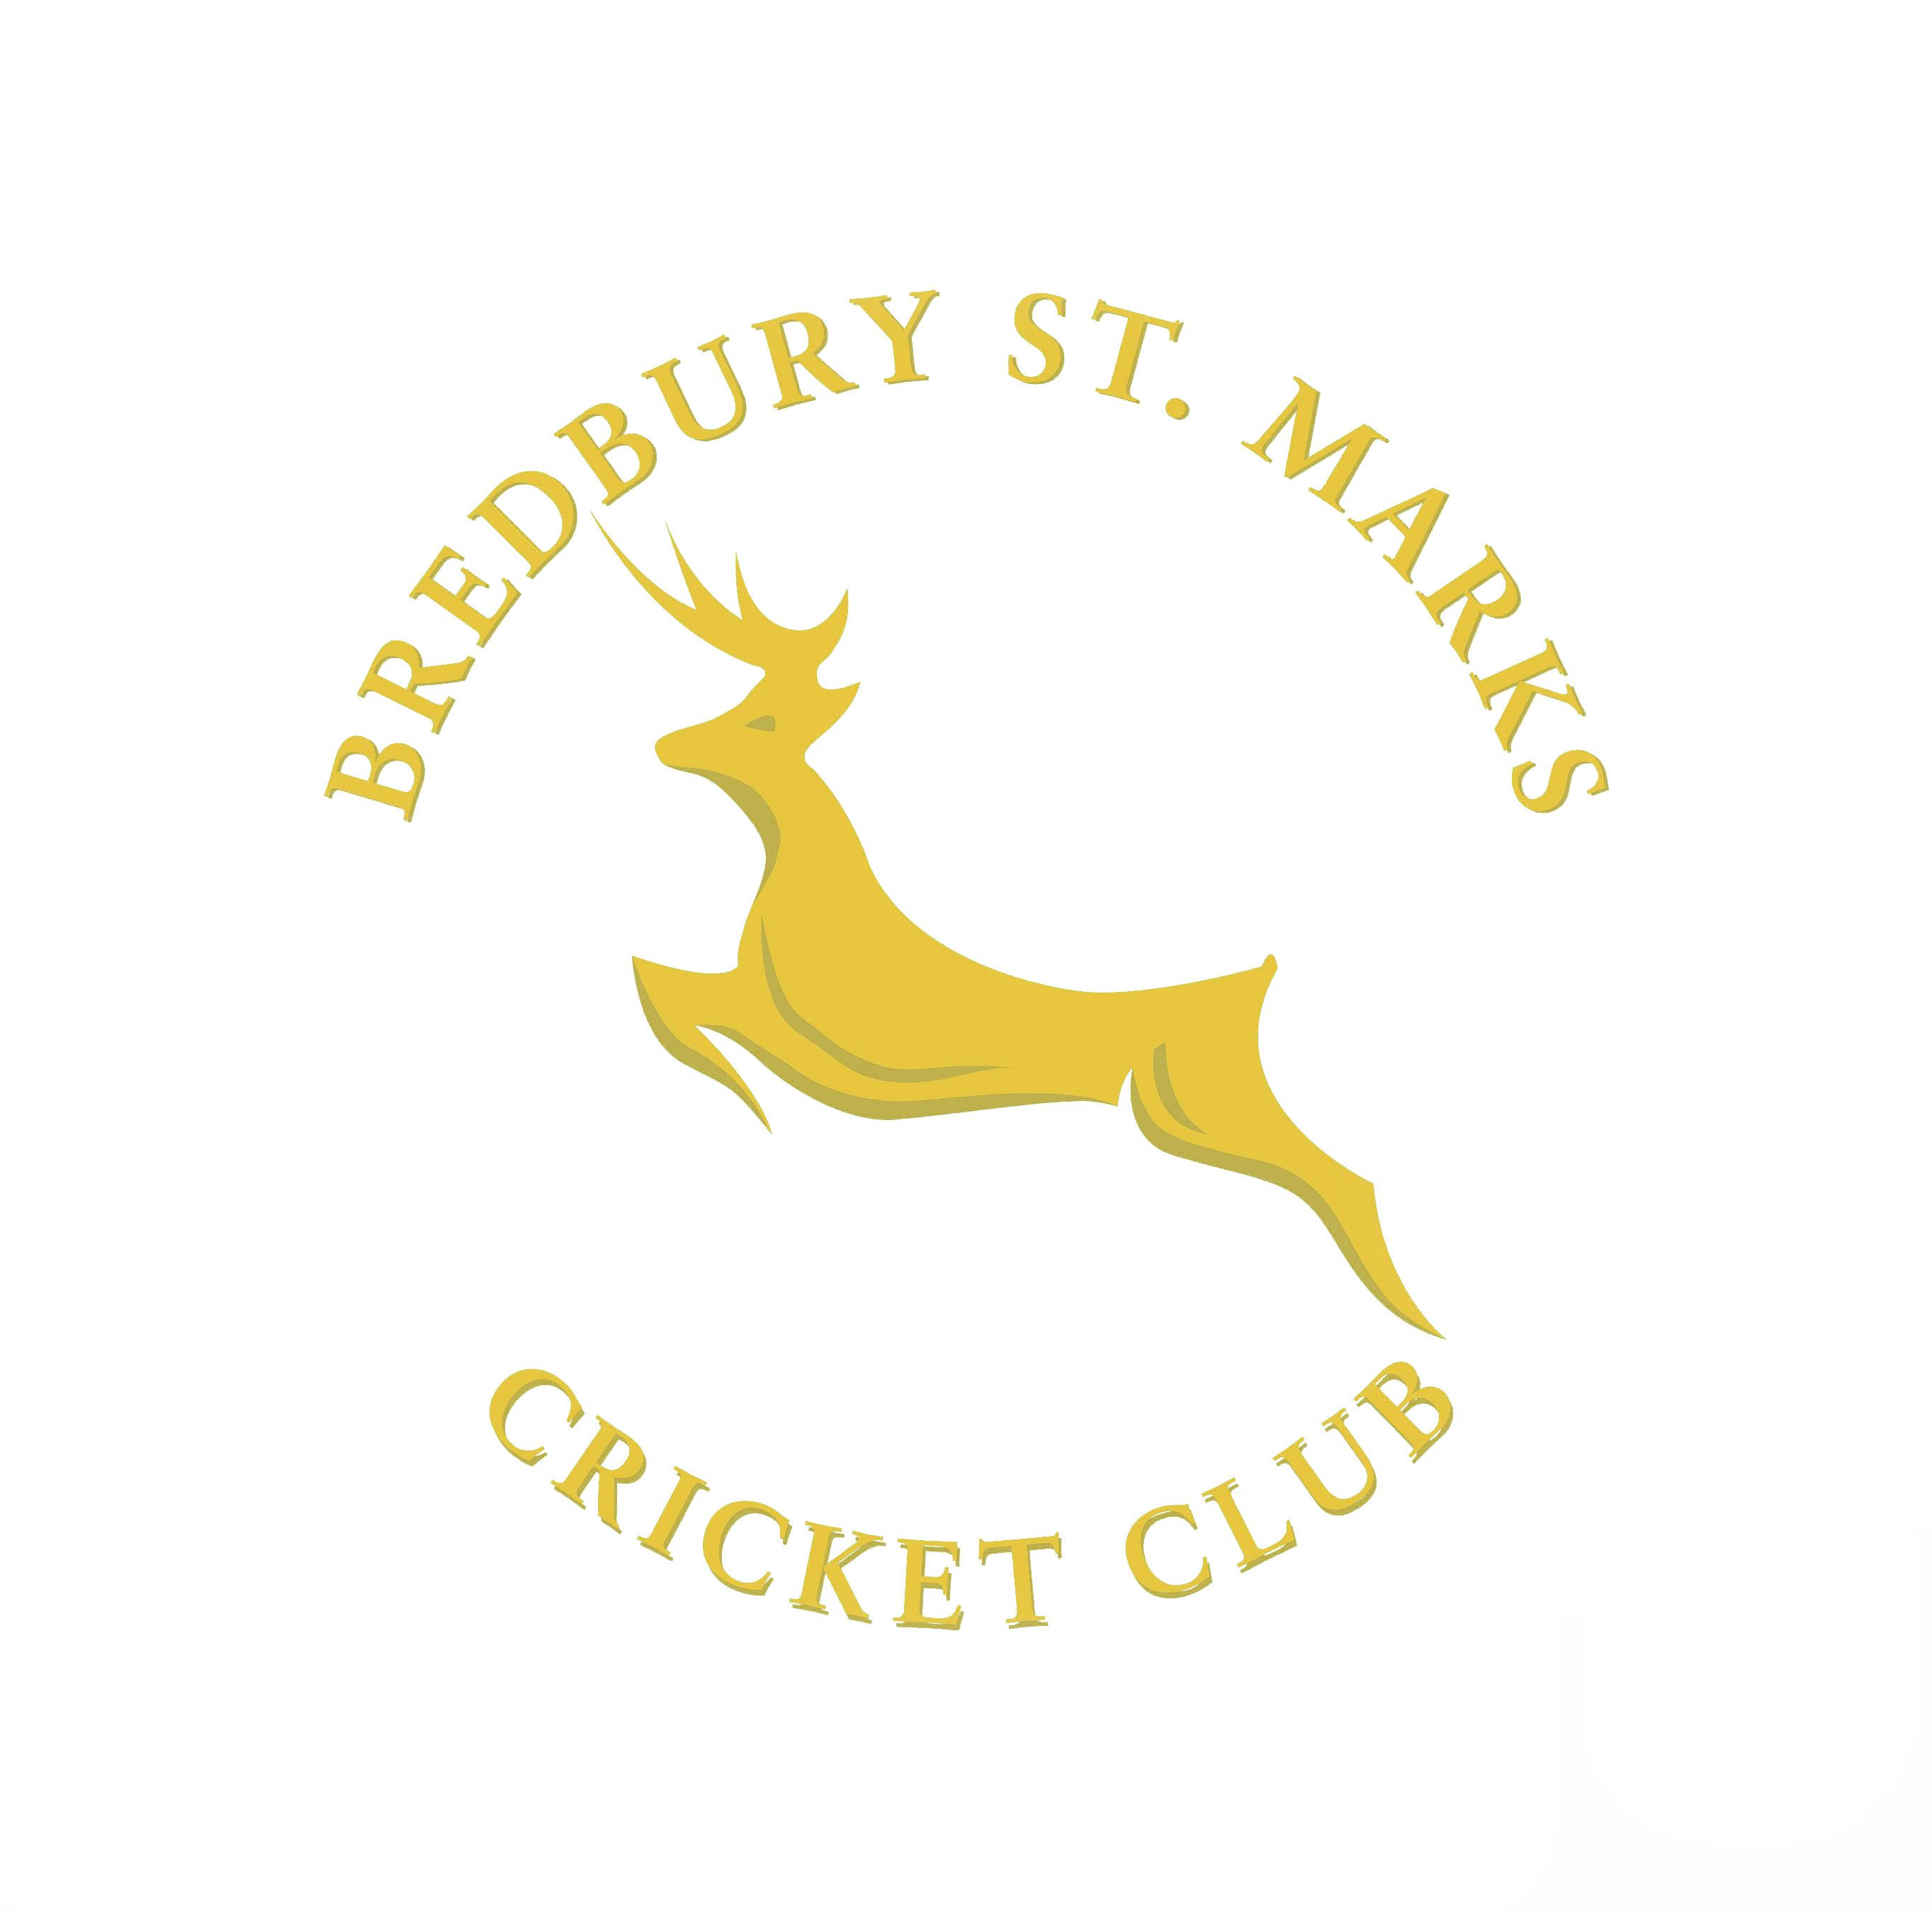 Bredbury St Marks Cricket Club